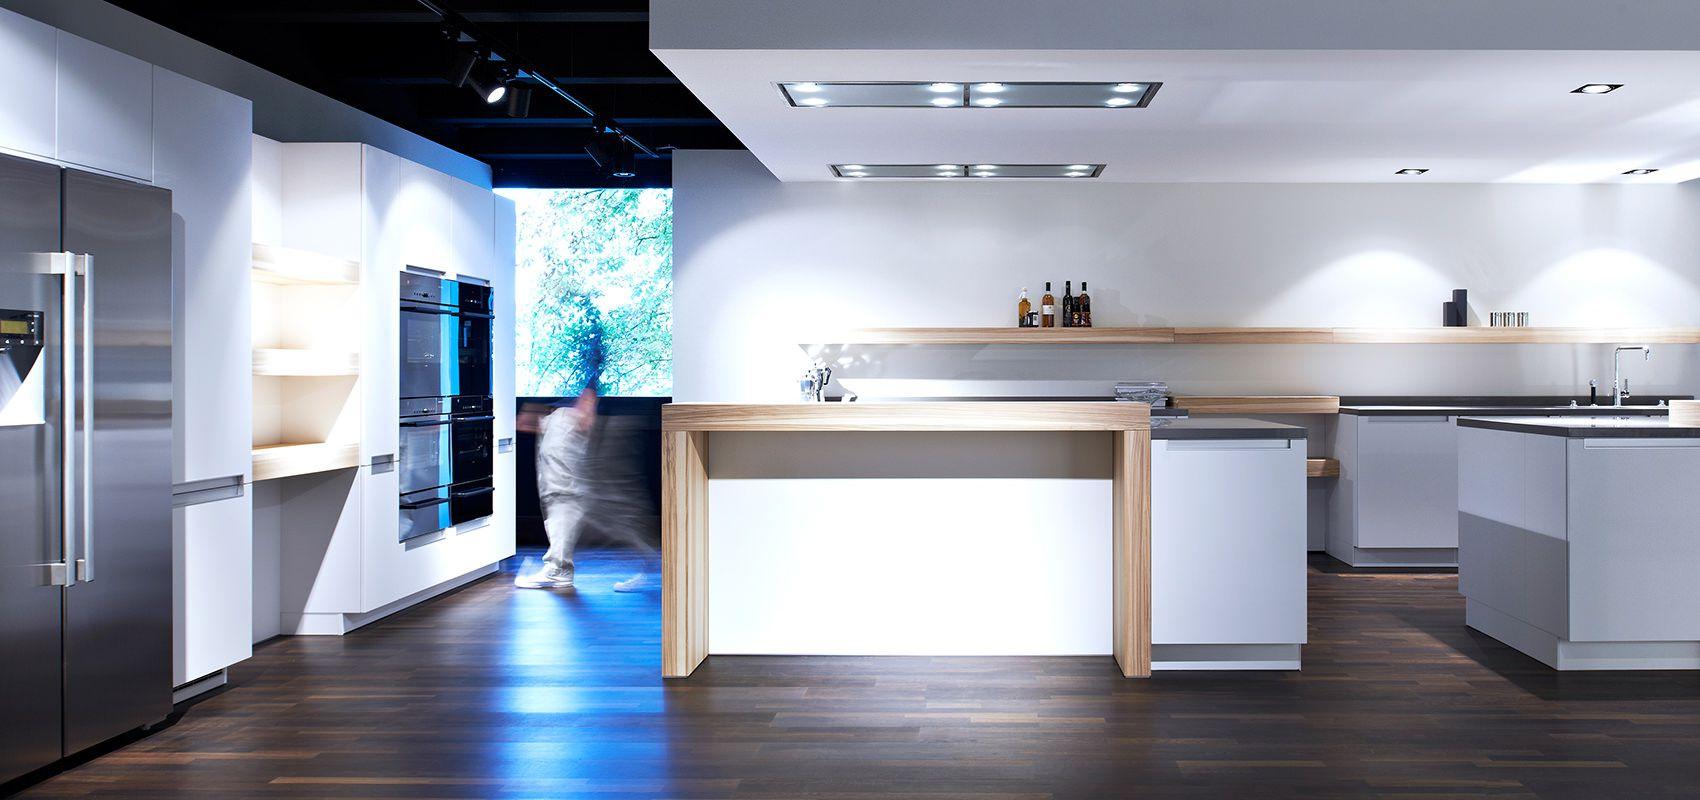 kchen siegen affordable kchen lampe in siegen with kchen siegen affordable plan kuchyn. Black Bedroom Furniture Sets. Home Design Ideas